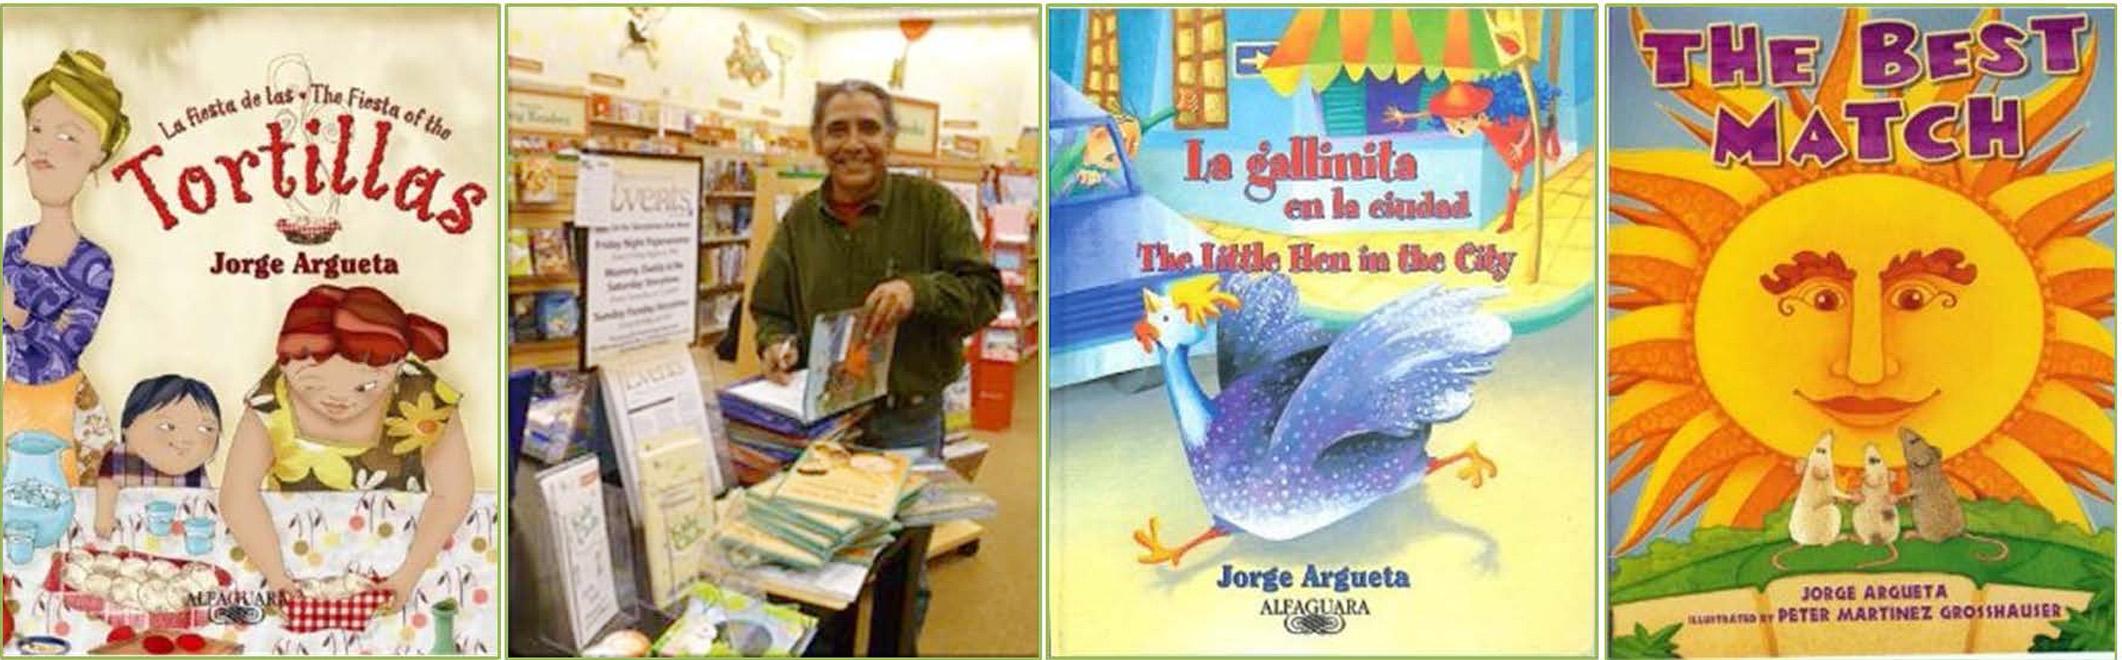 'Ritual para dormir' con el escritor Jorge Argueta